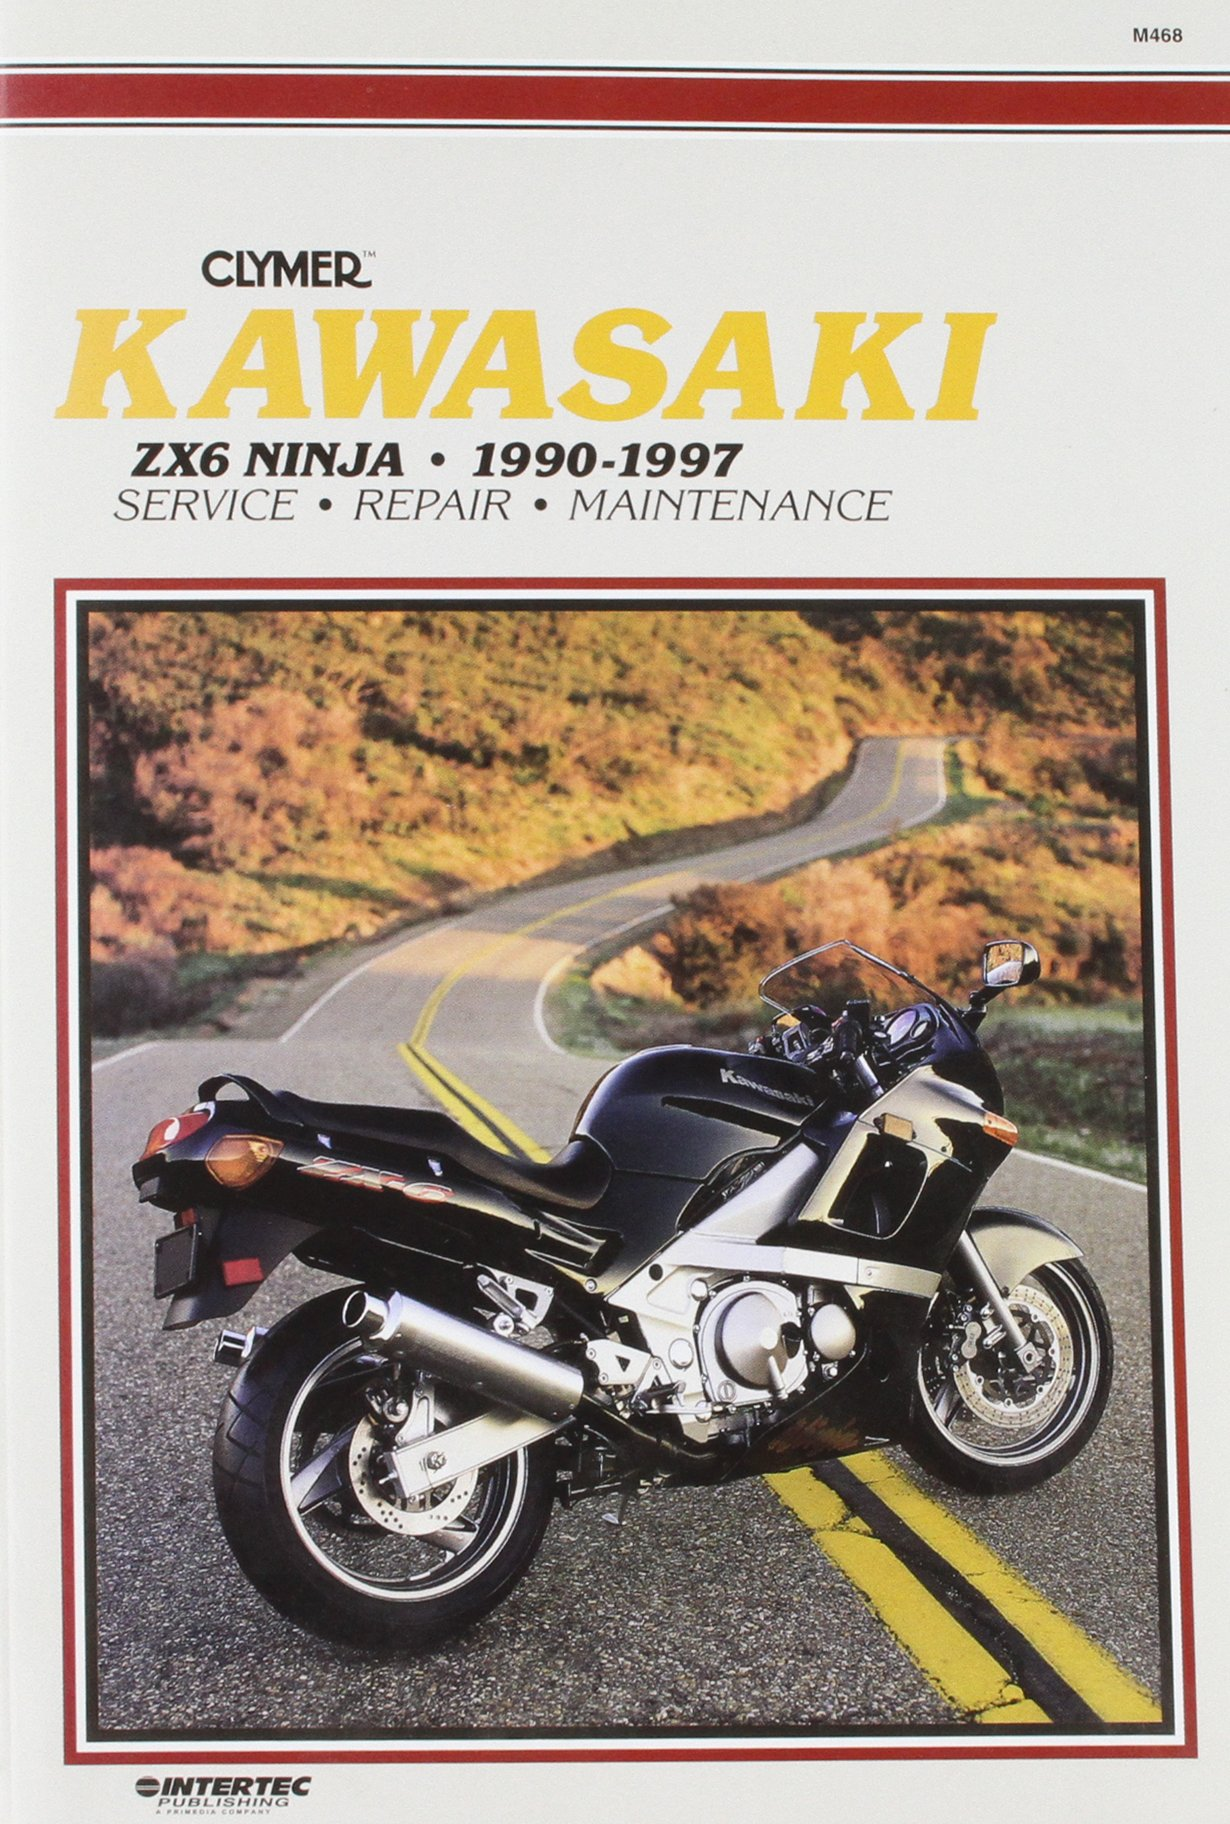 1990 Zx6 Repair Manual Zx6e Wiring Diagram Kawasaki Ninja 1997 Clymer Workshop Amazon Co Uk Rh 2008